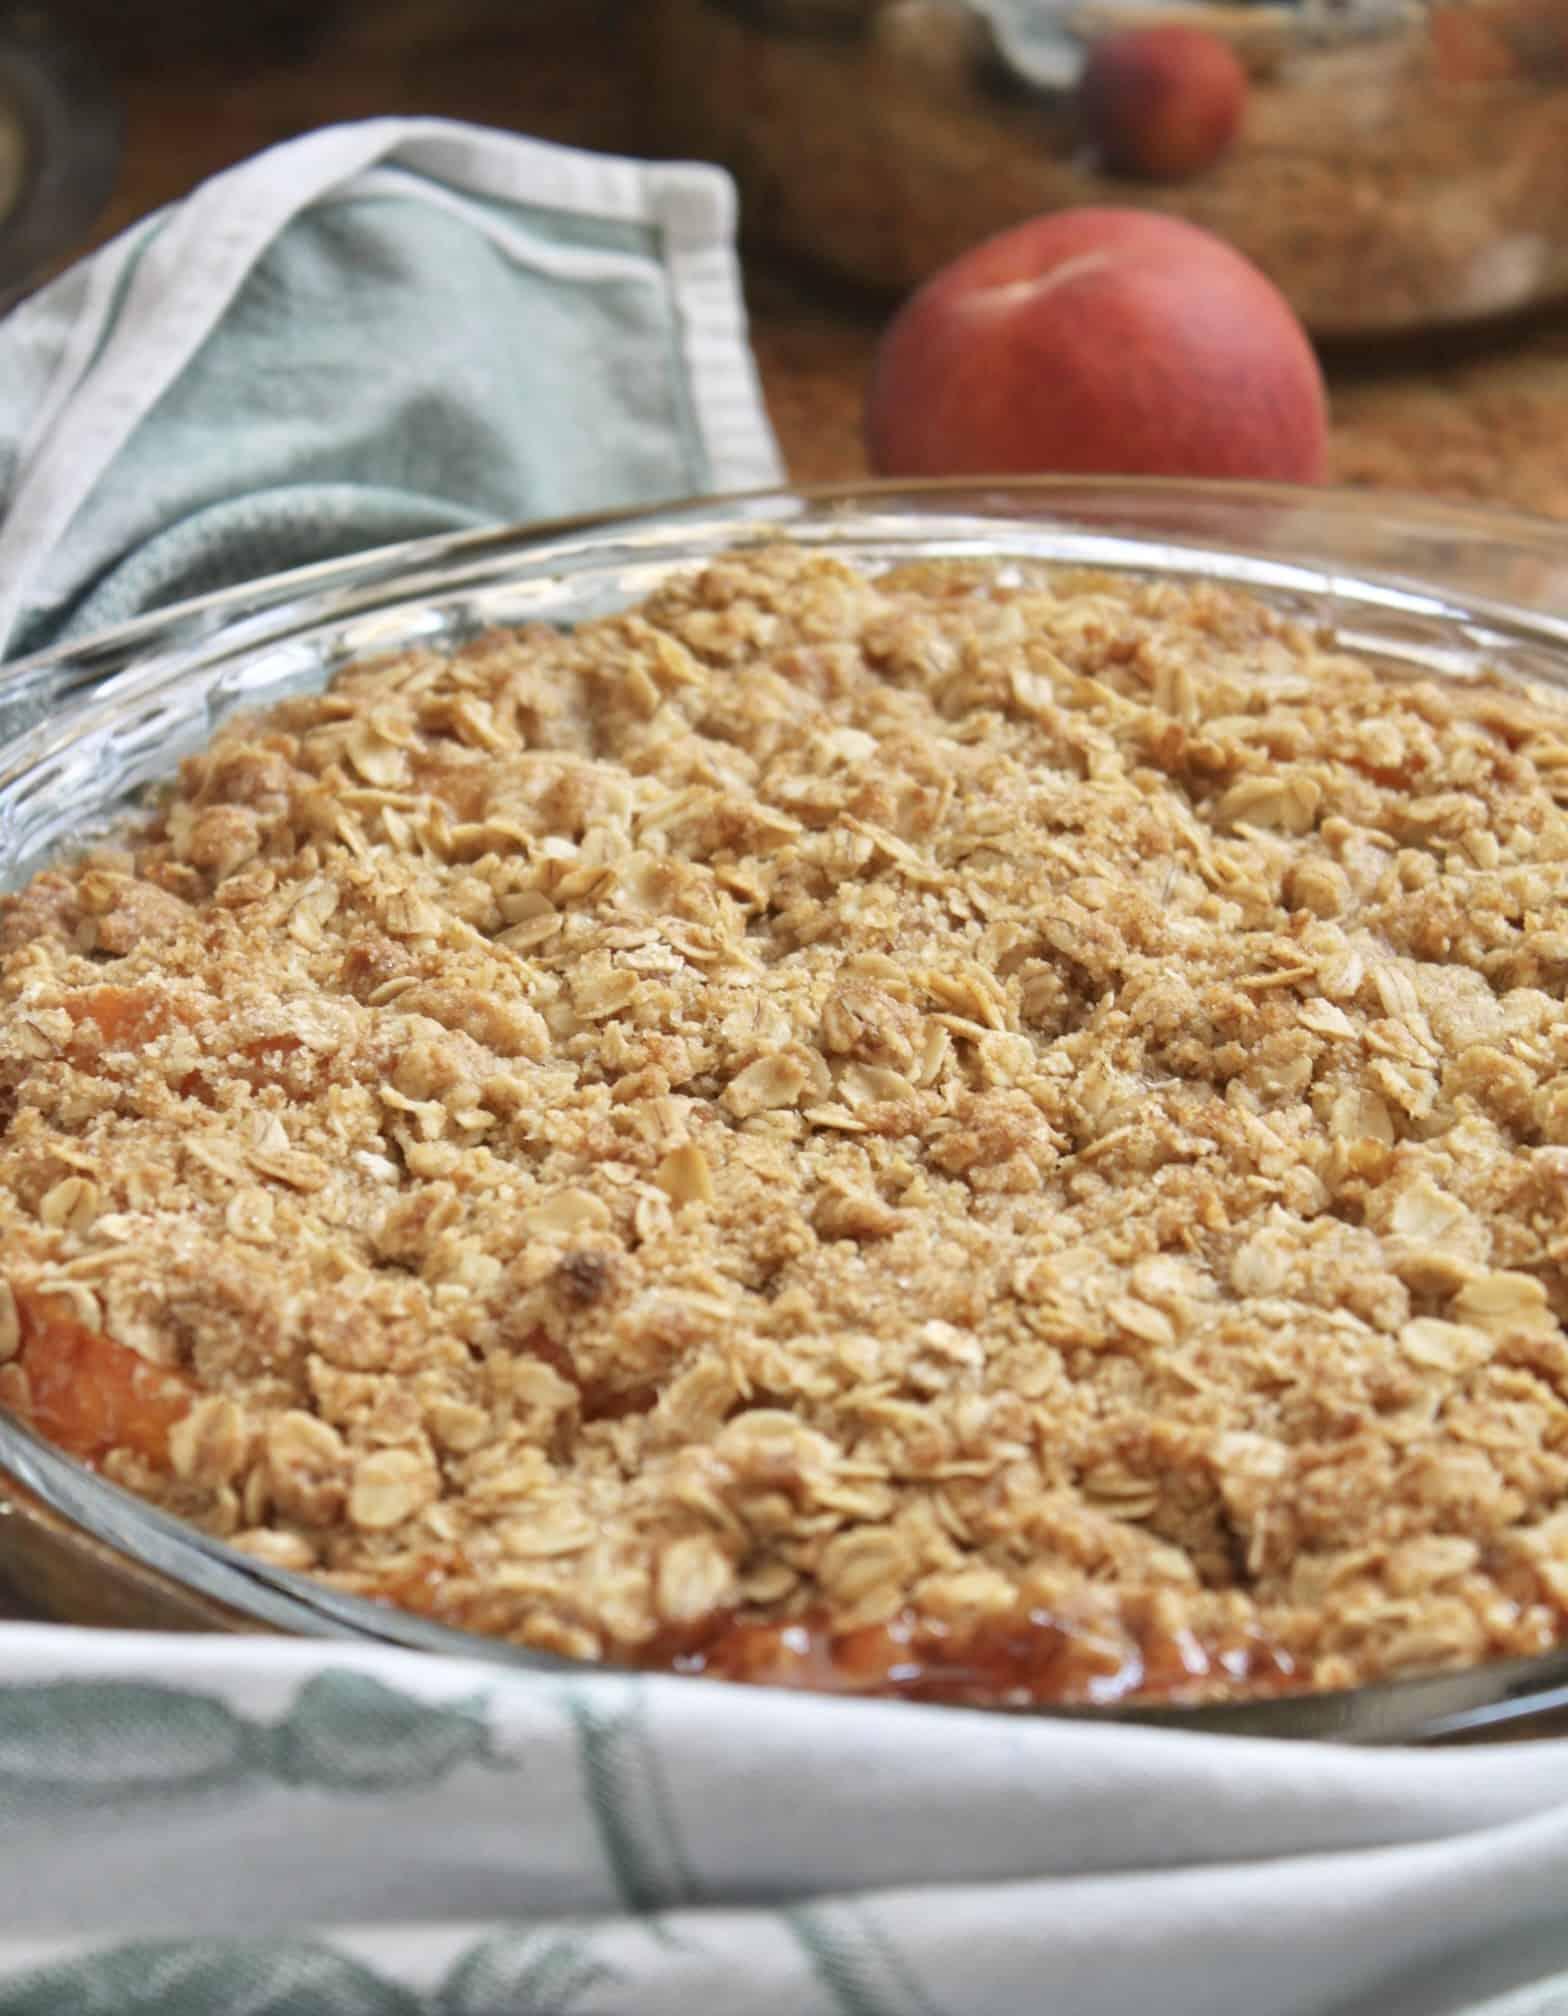 baked peach crisp